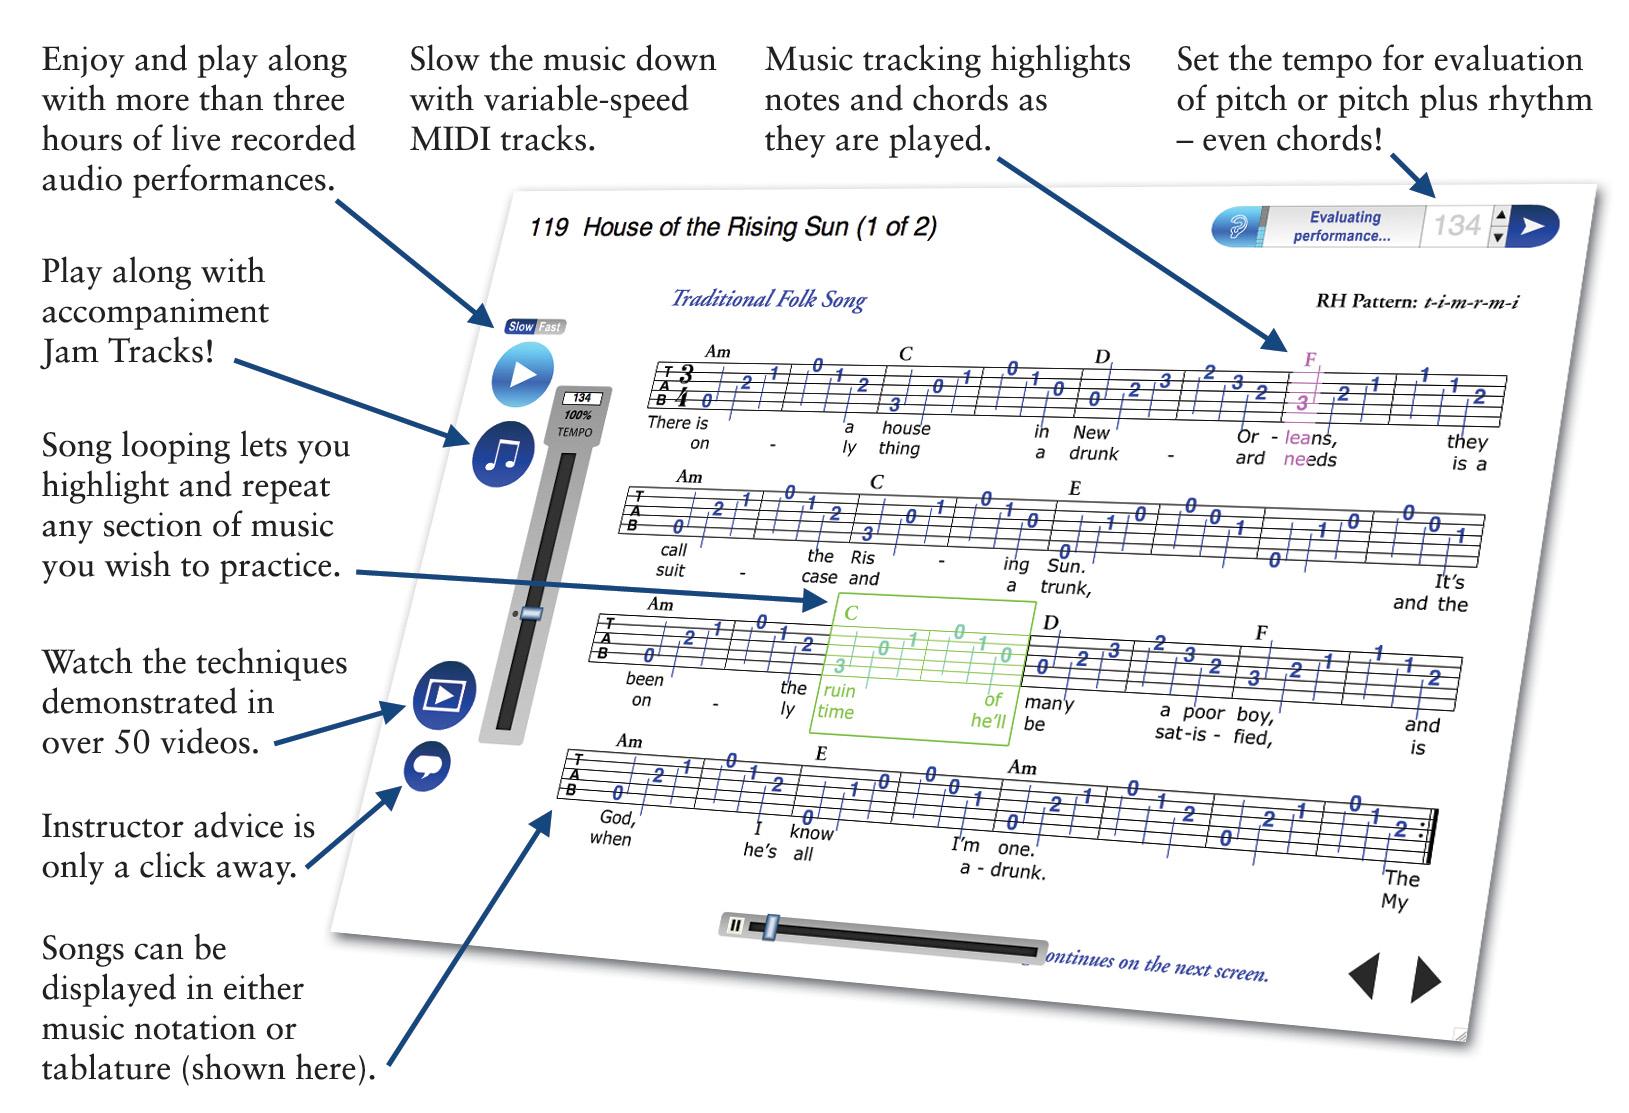 Emedia guitar method deluxe instructional software bundle hr.